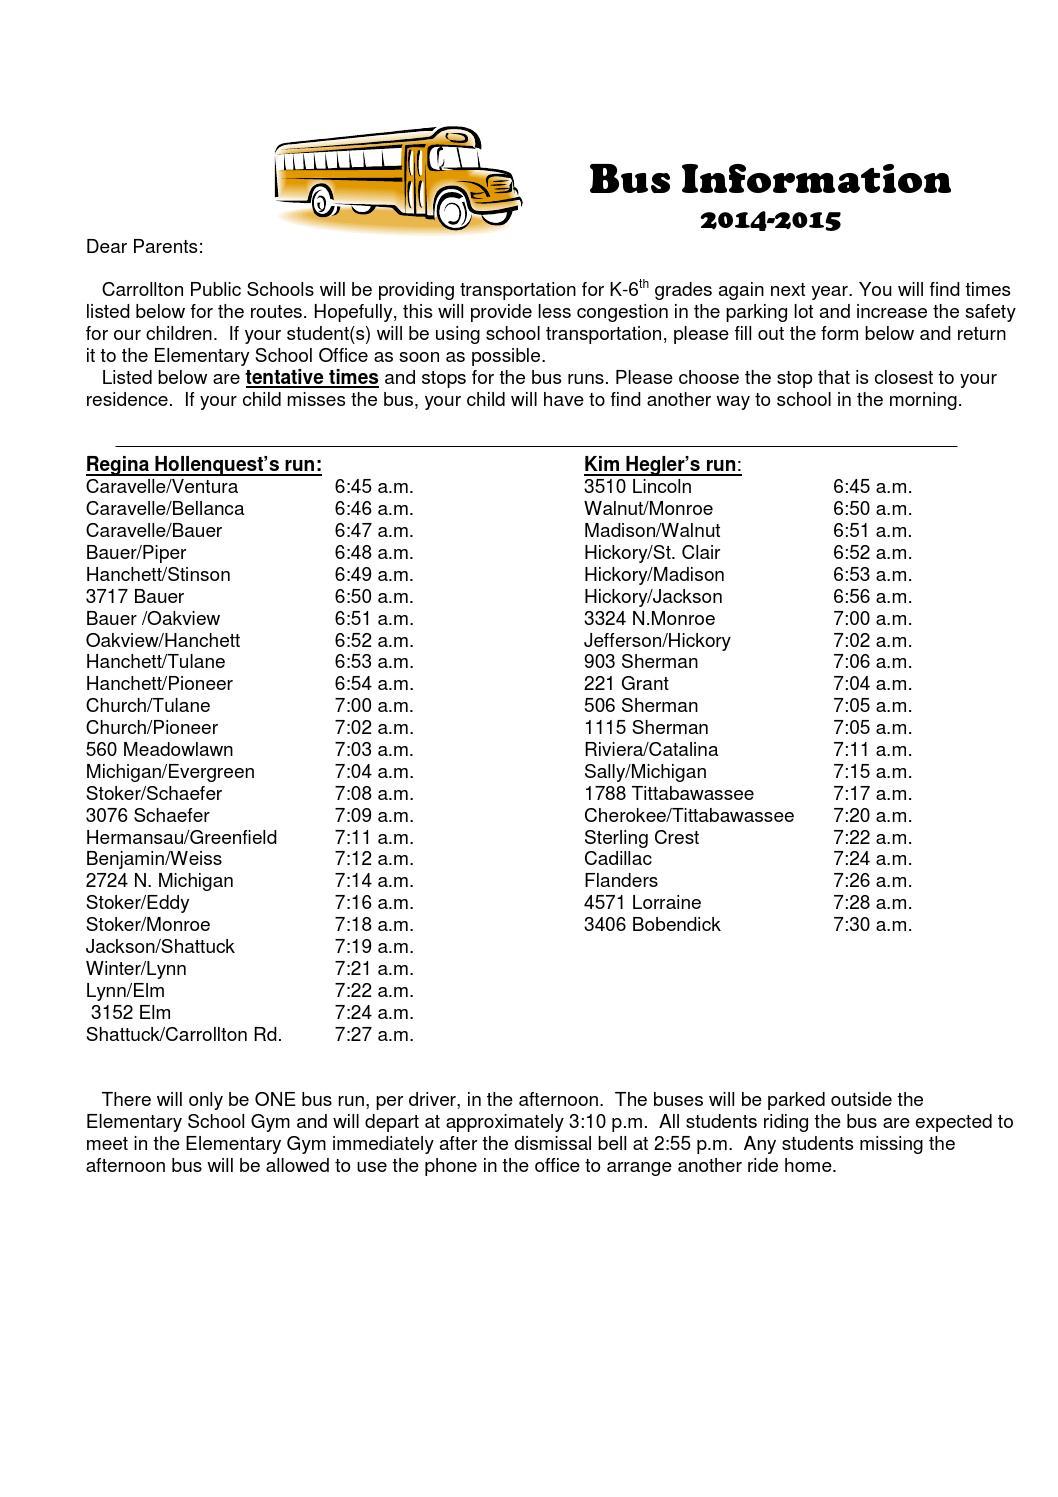 bus-sign-up-14-15 by Carrollton Public Schools - issuu